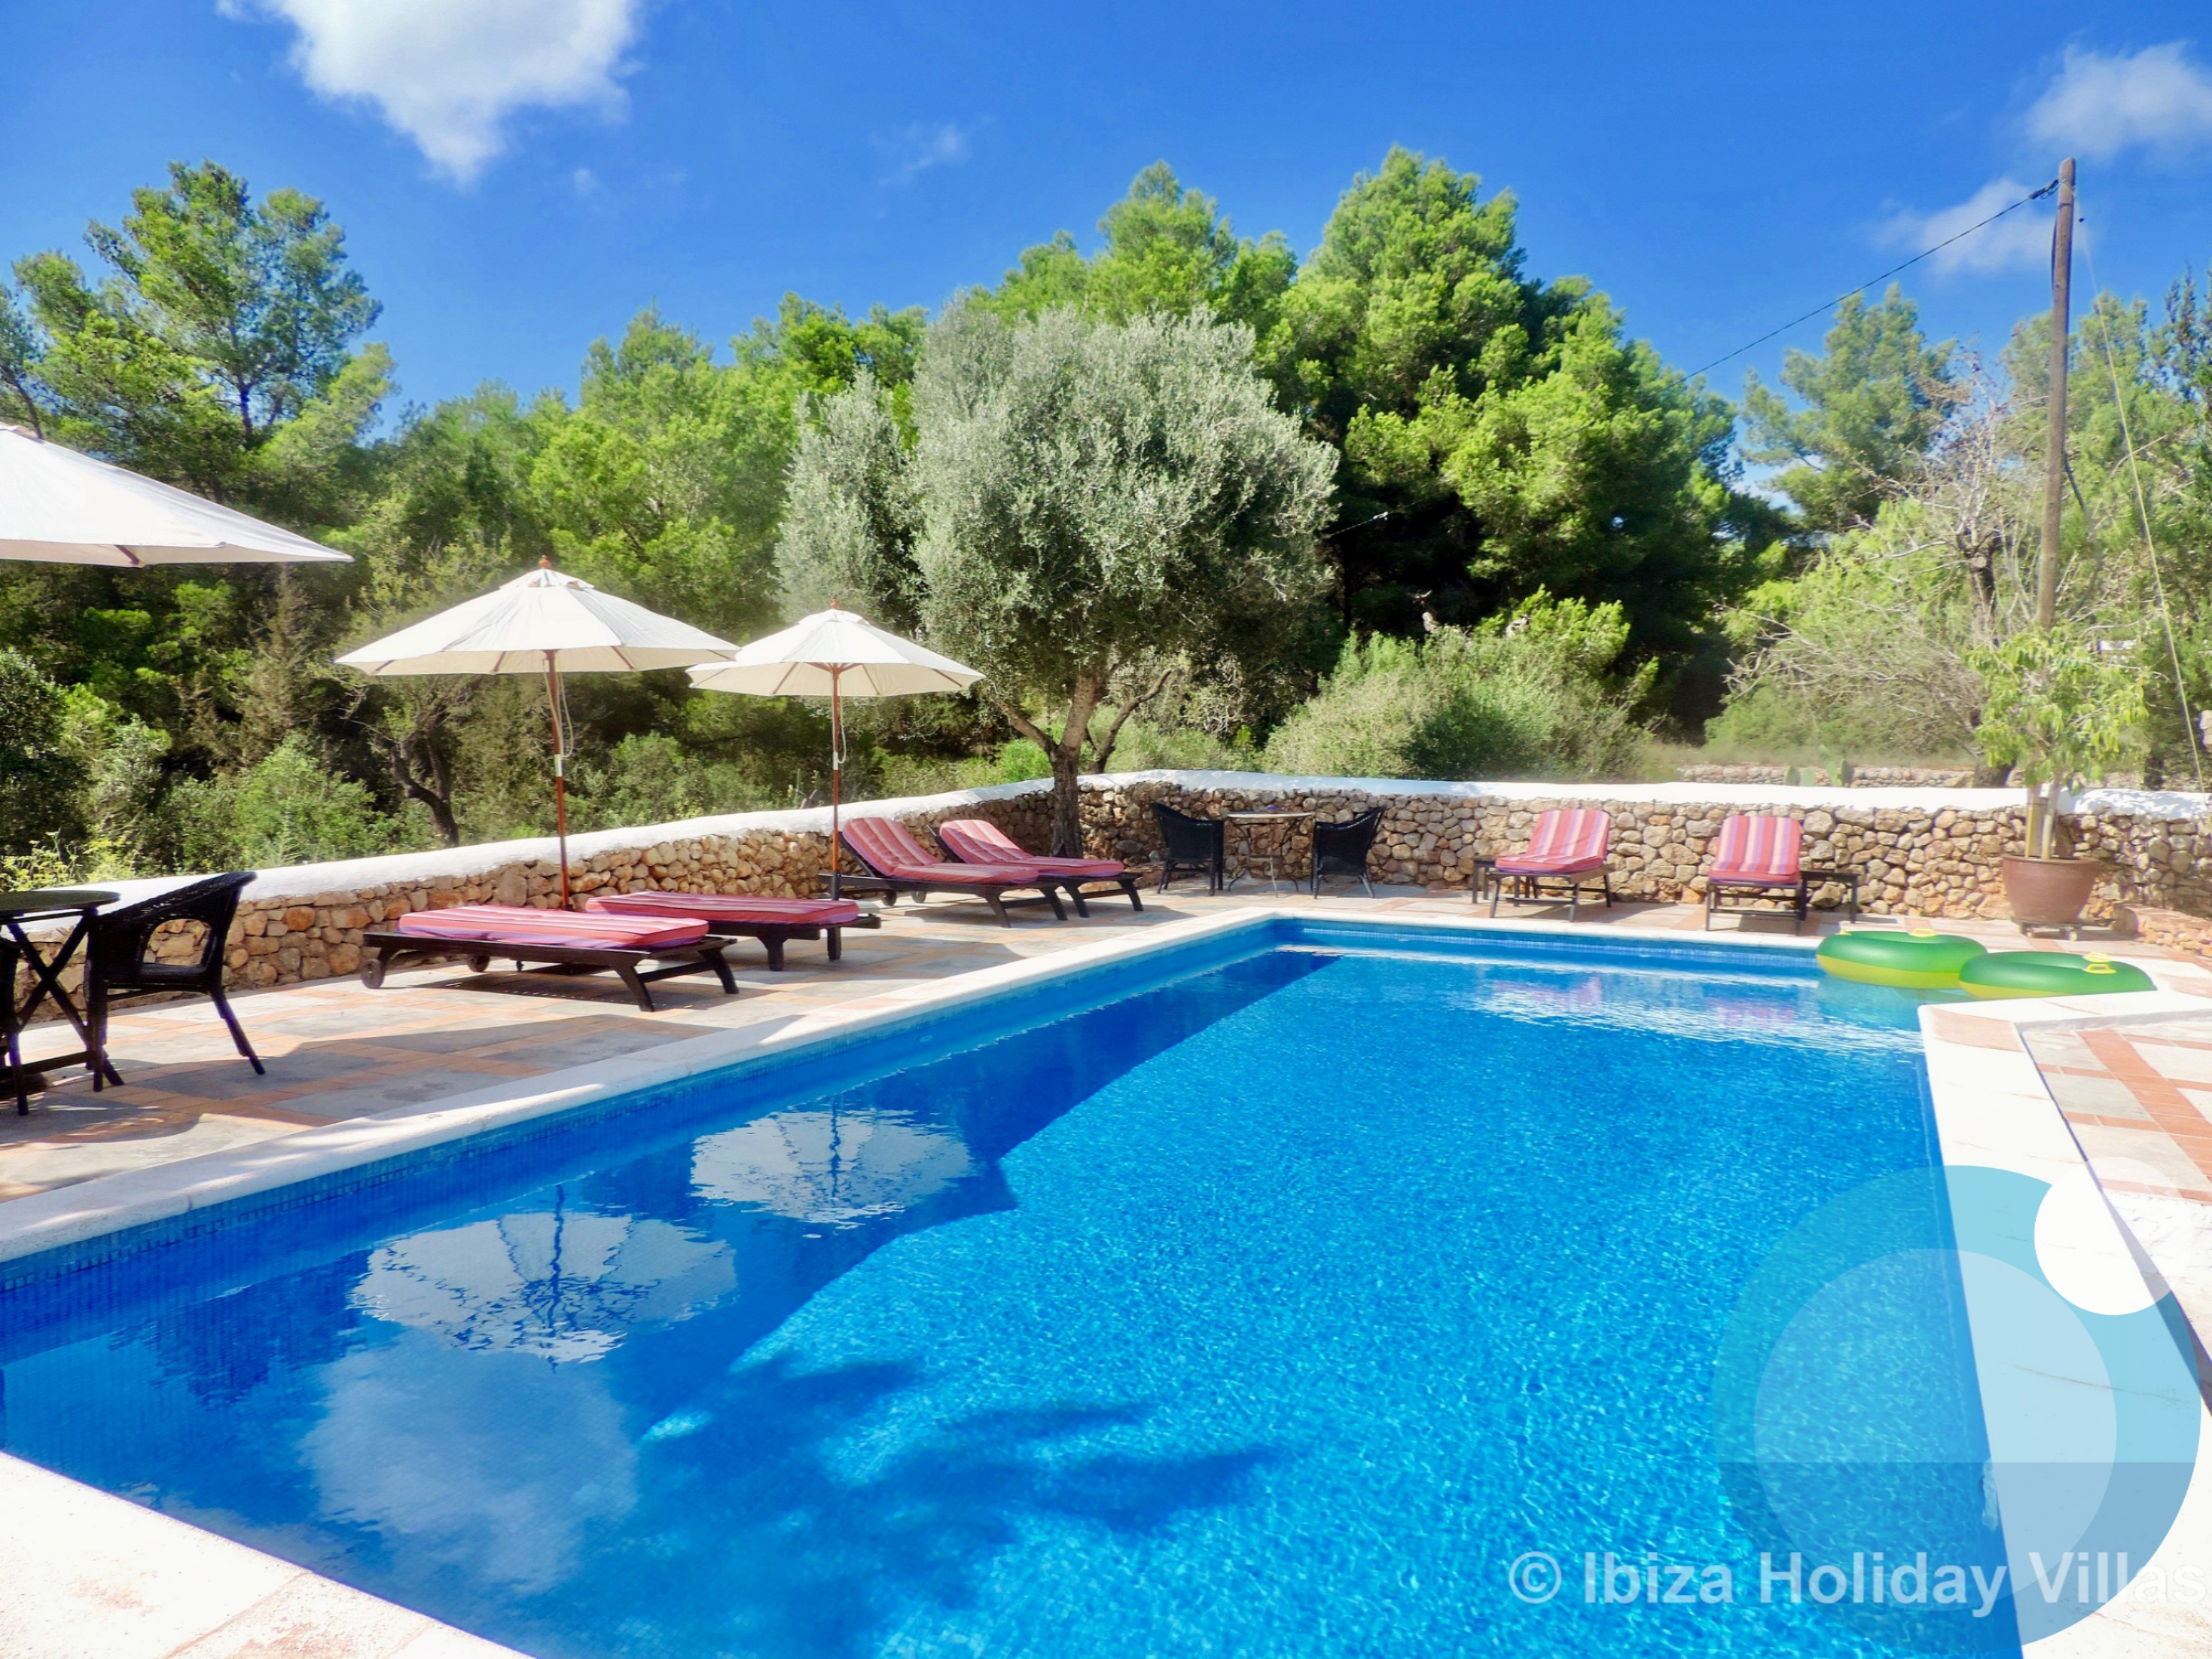 Holiday Villa Ibiza - Viña Vell